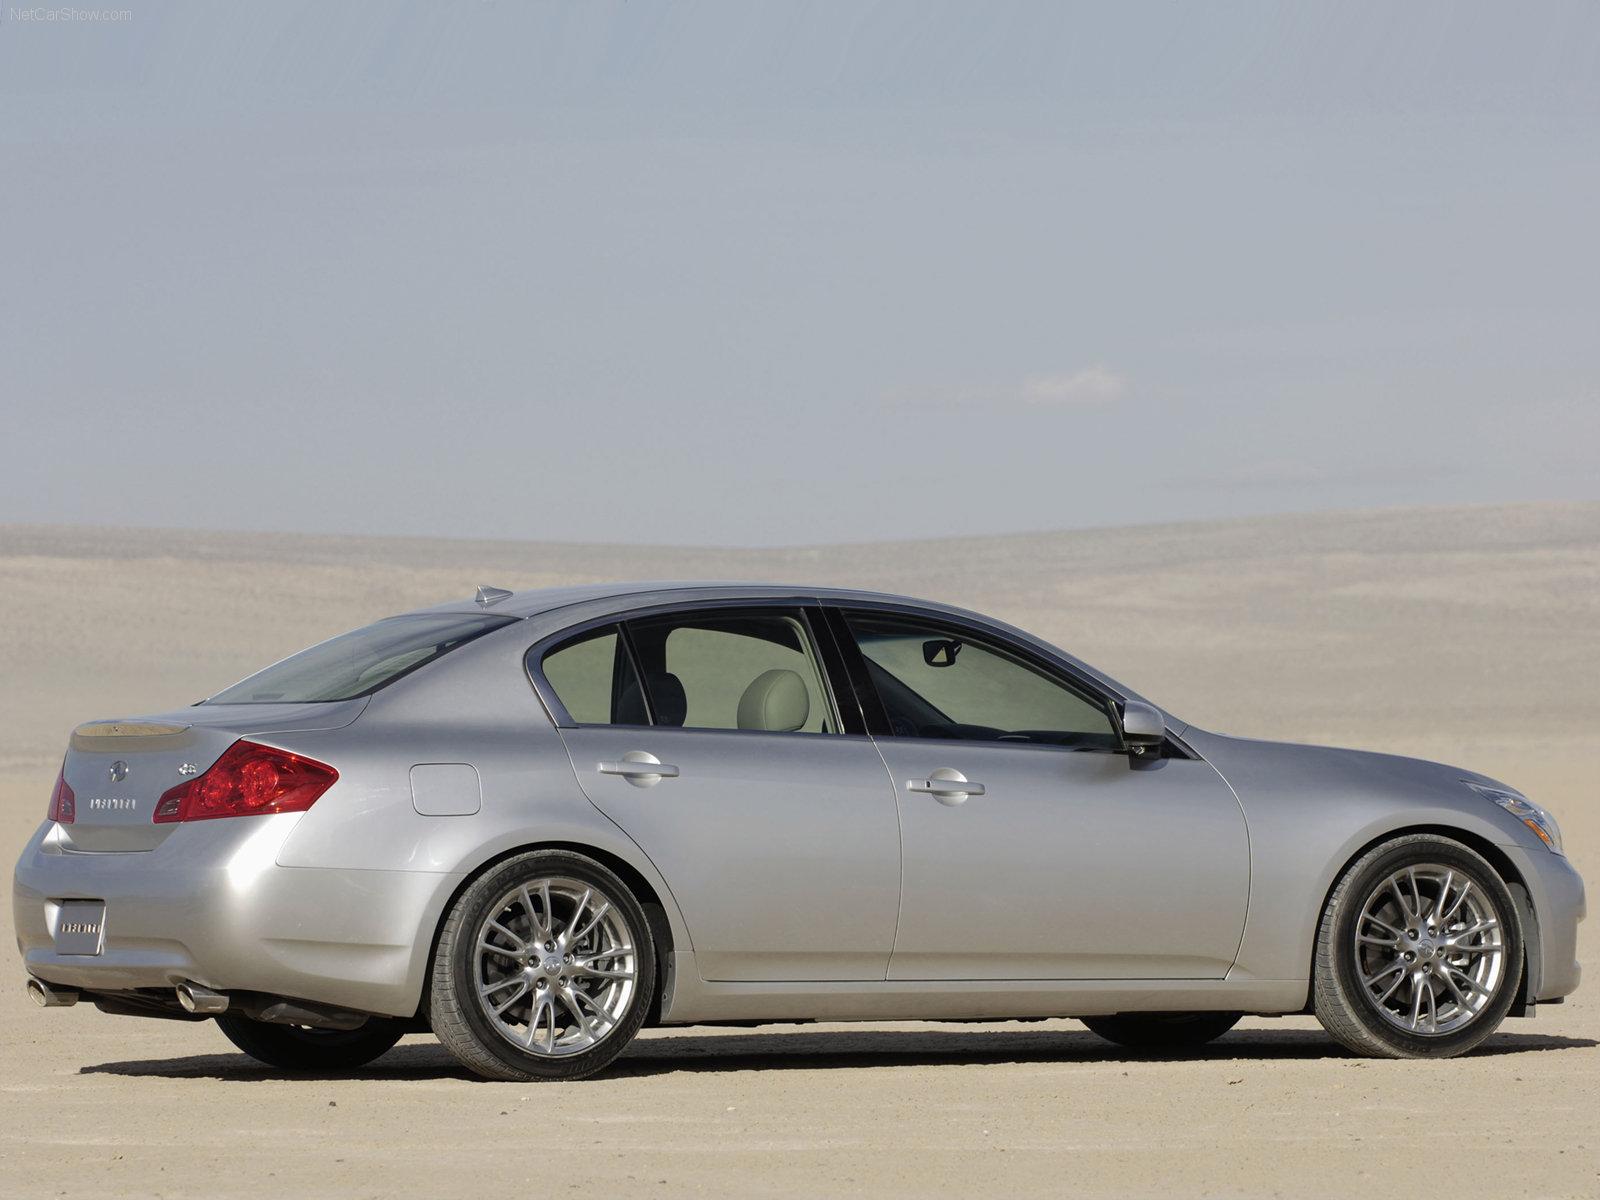 New infiniti g35 sedan pictures